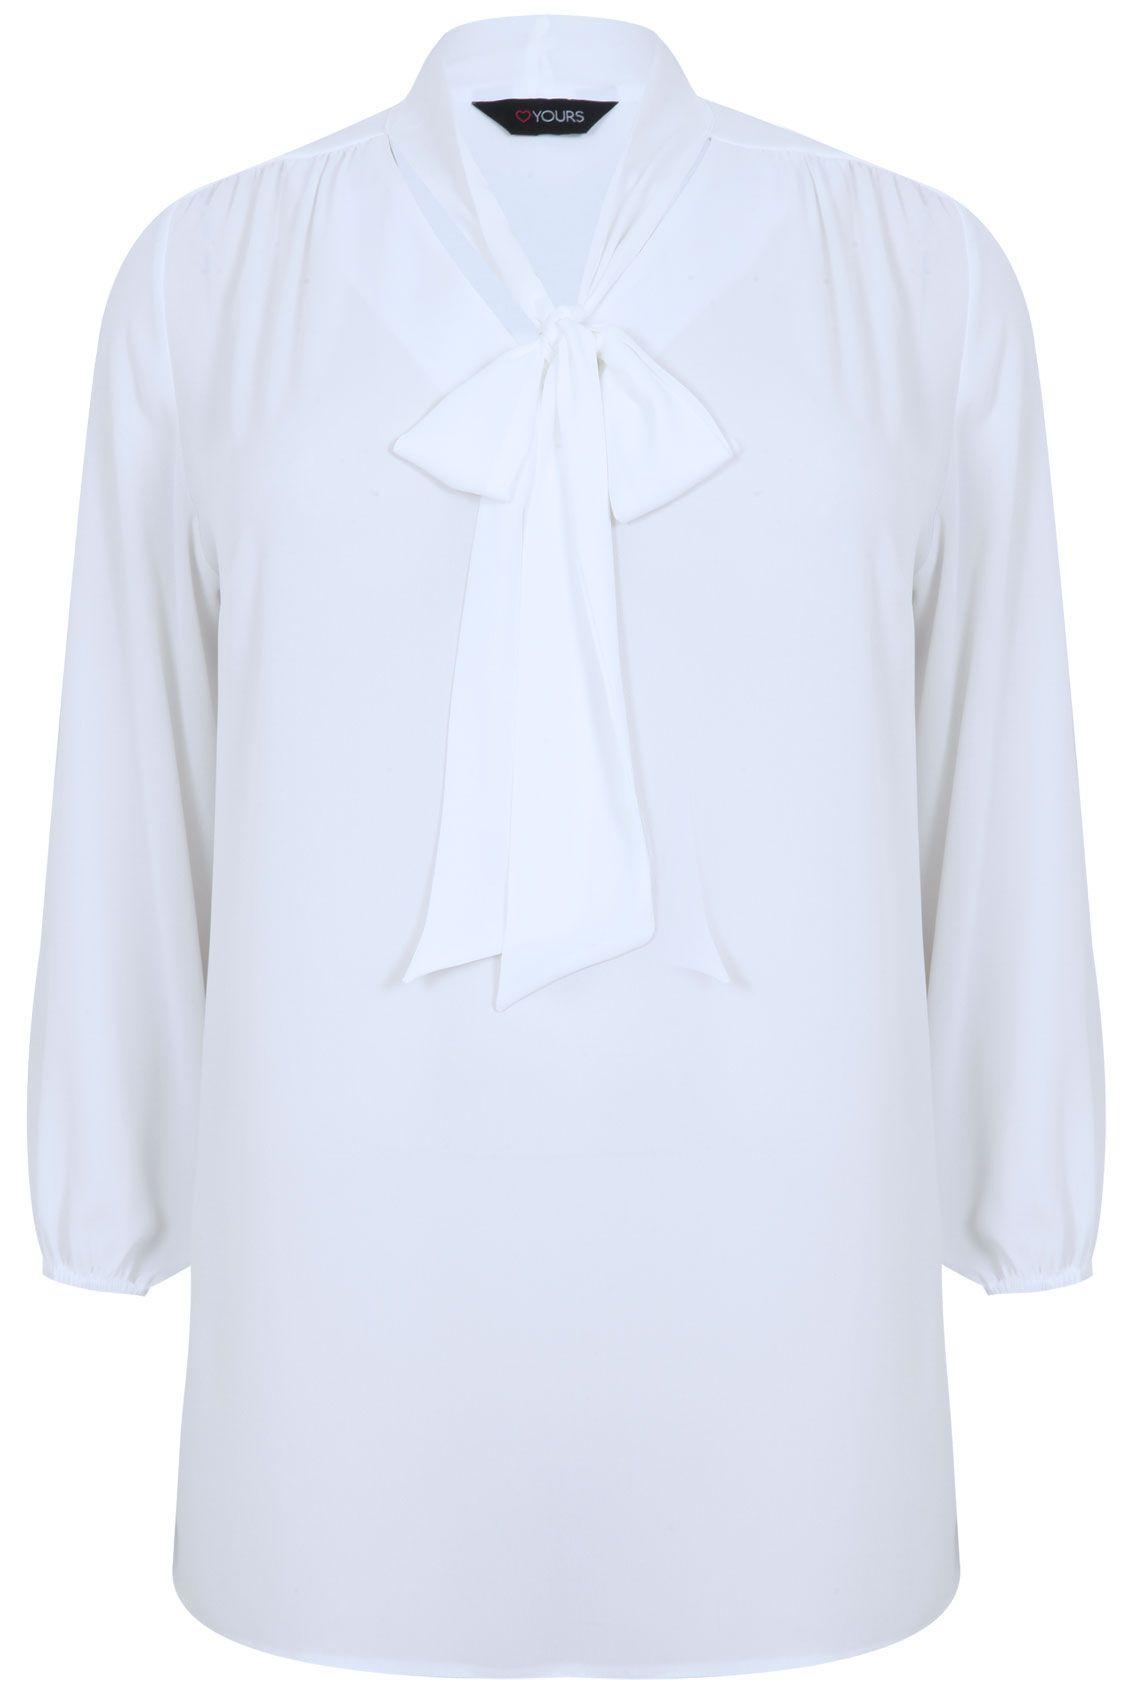 Ivory long sleeve chiffon pussy bow blouse simple closet